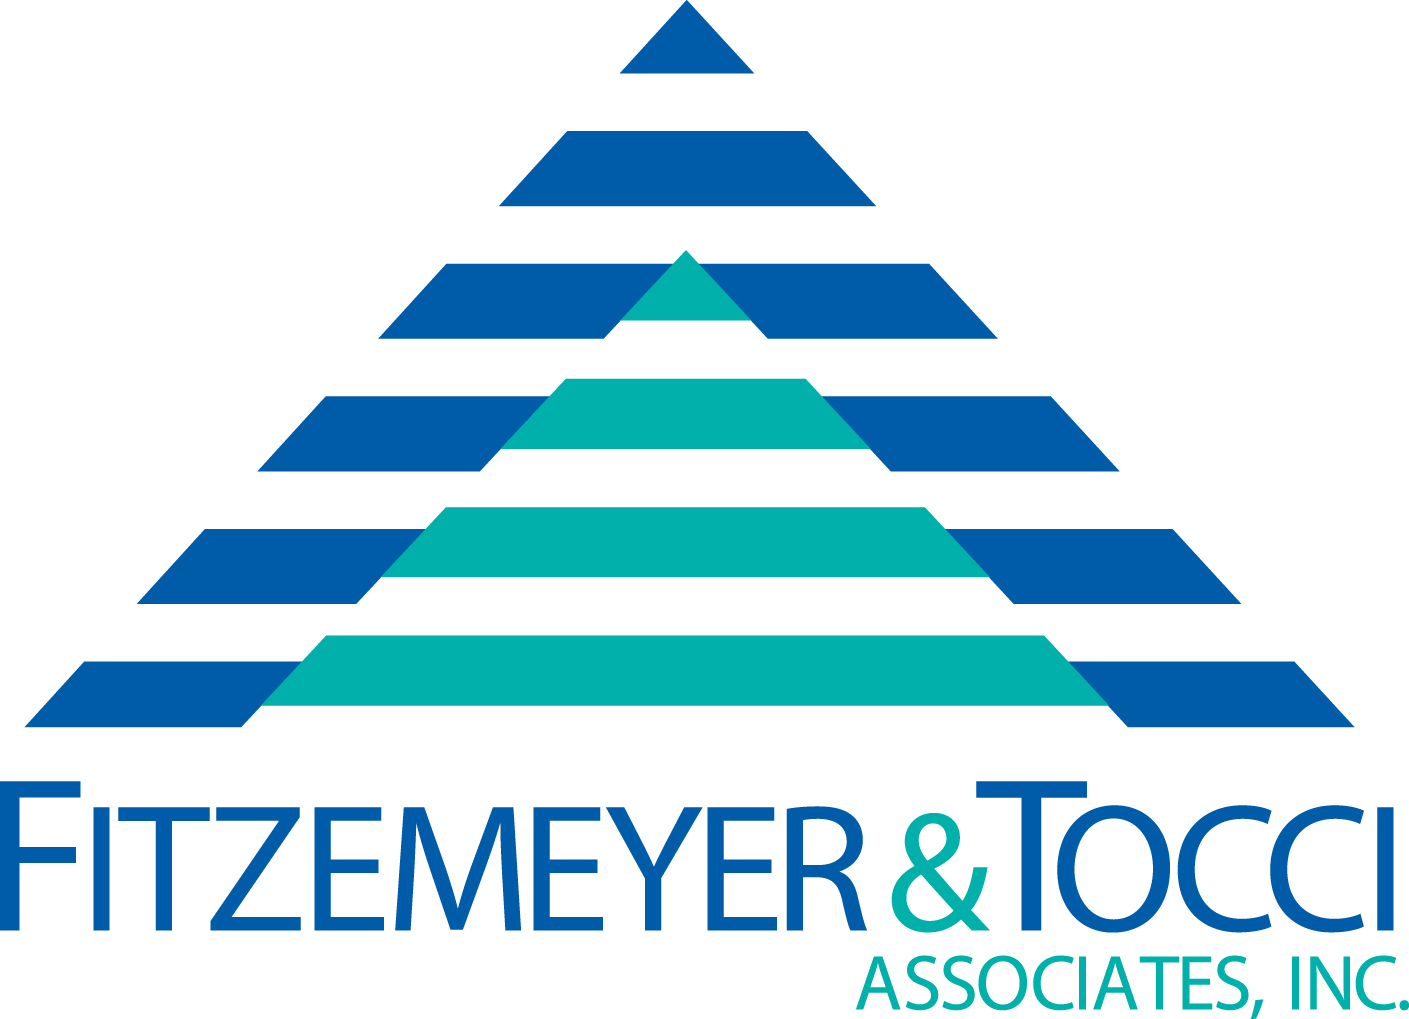 Fitzmeyer & Tocci